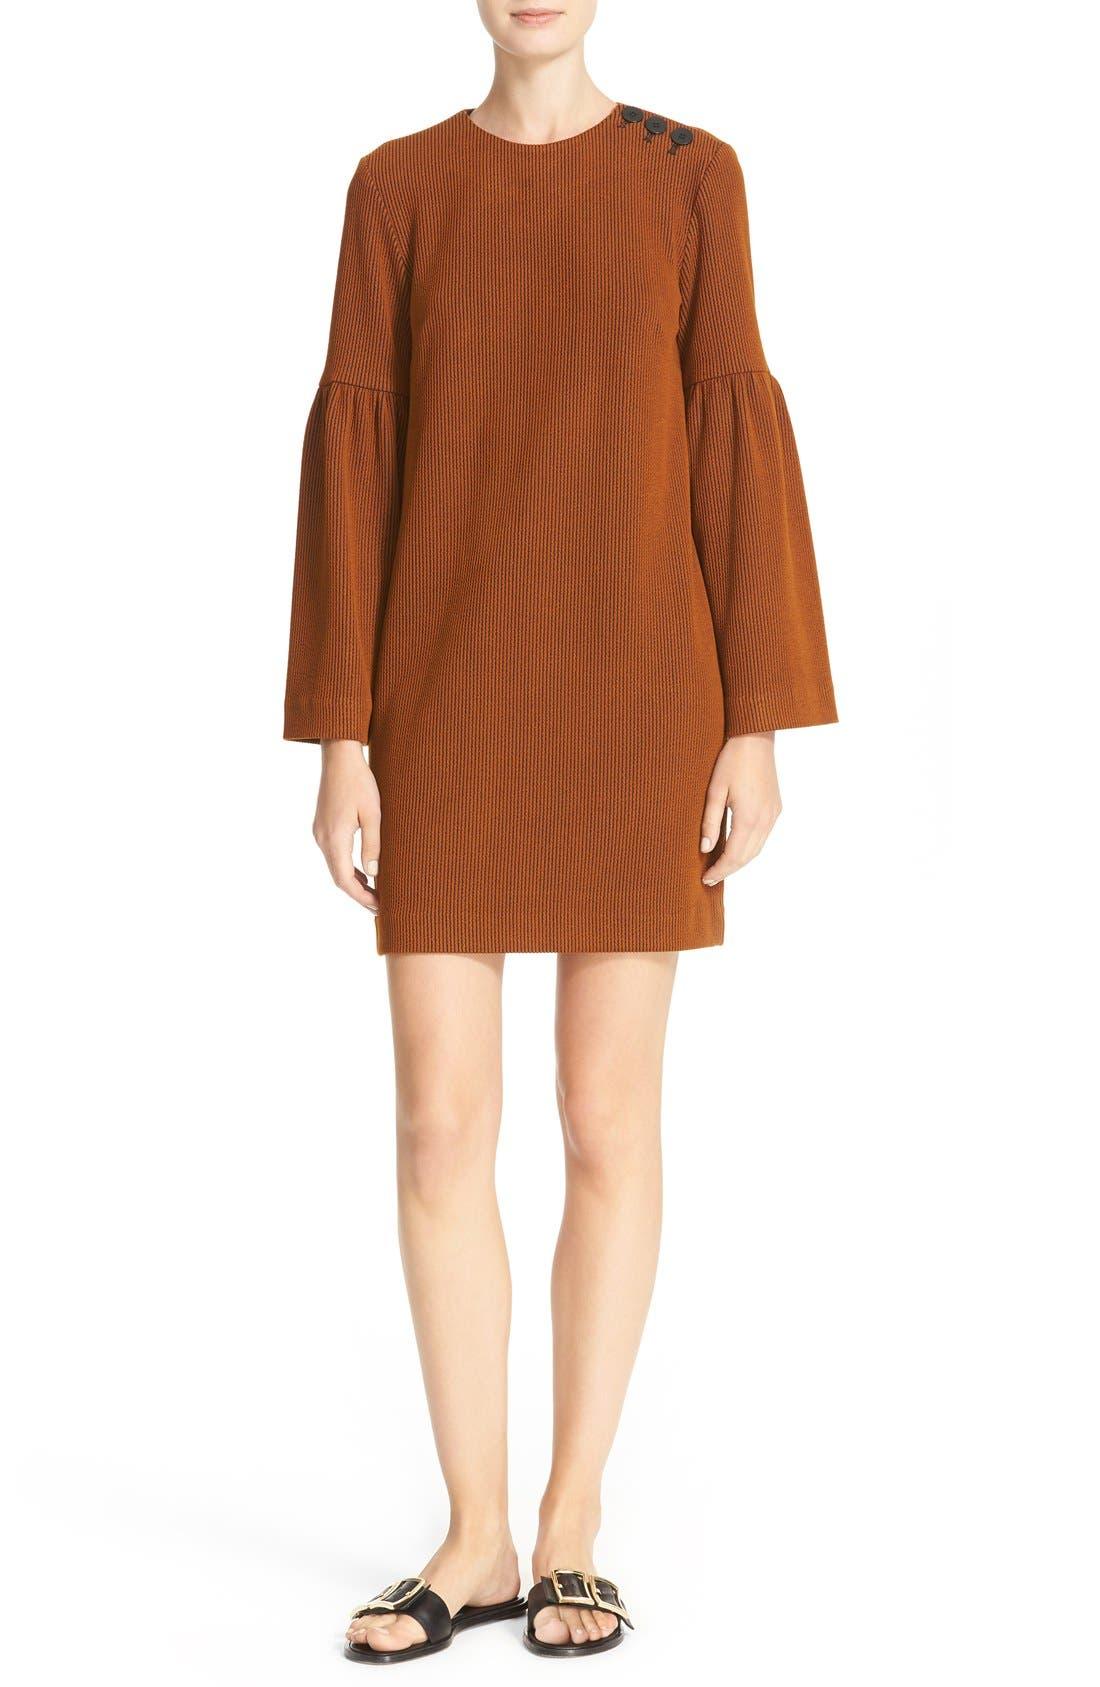 Alternate Image 1 Selected - Tibi Stripe Texture Knit Bell Sleeve Dress